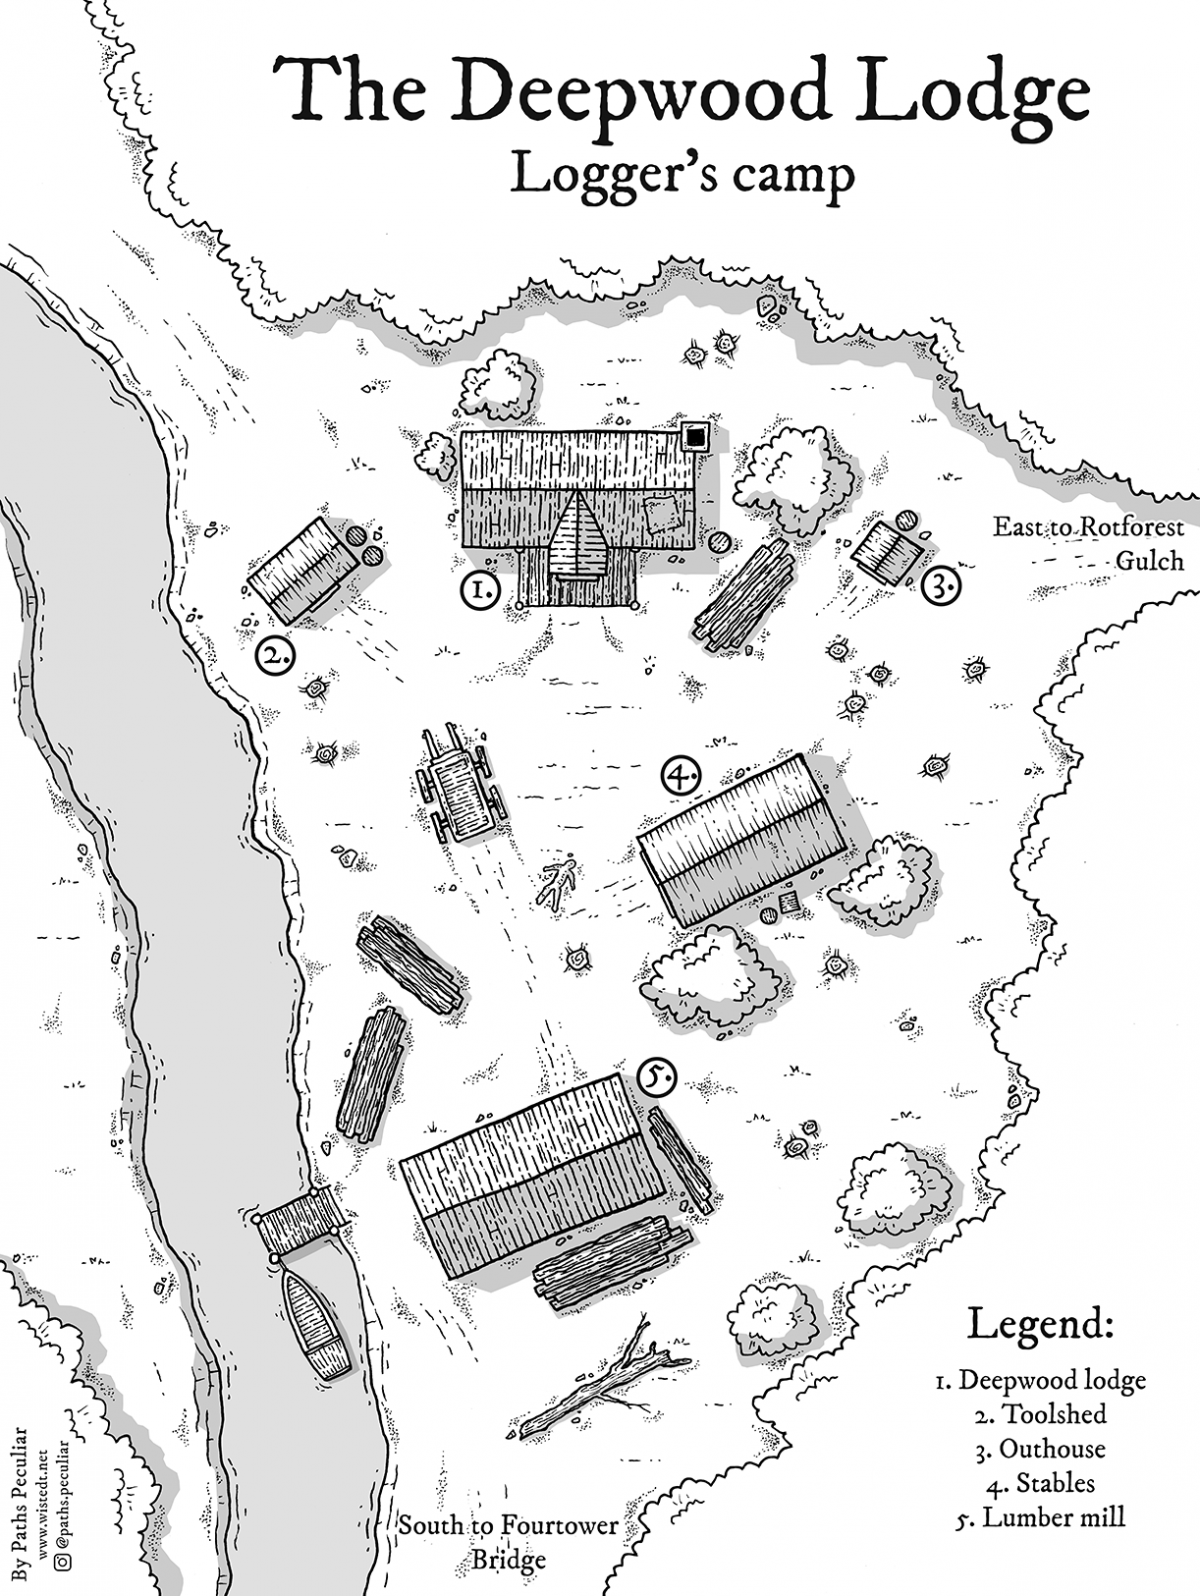 The Deepwood Lodge logger's camp